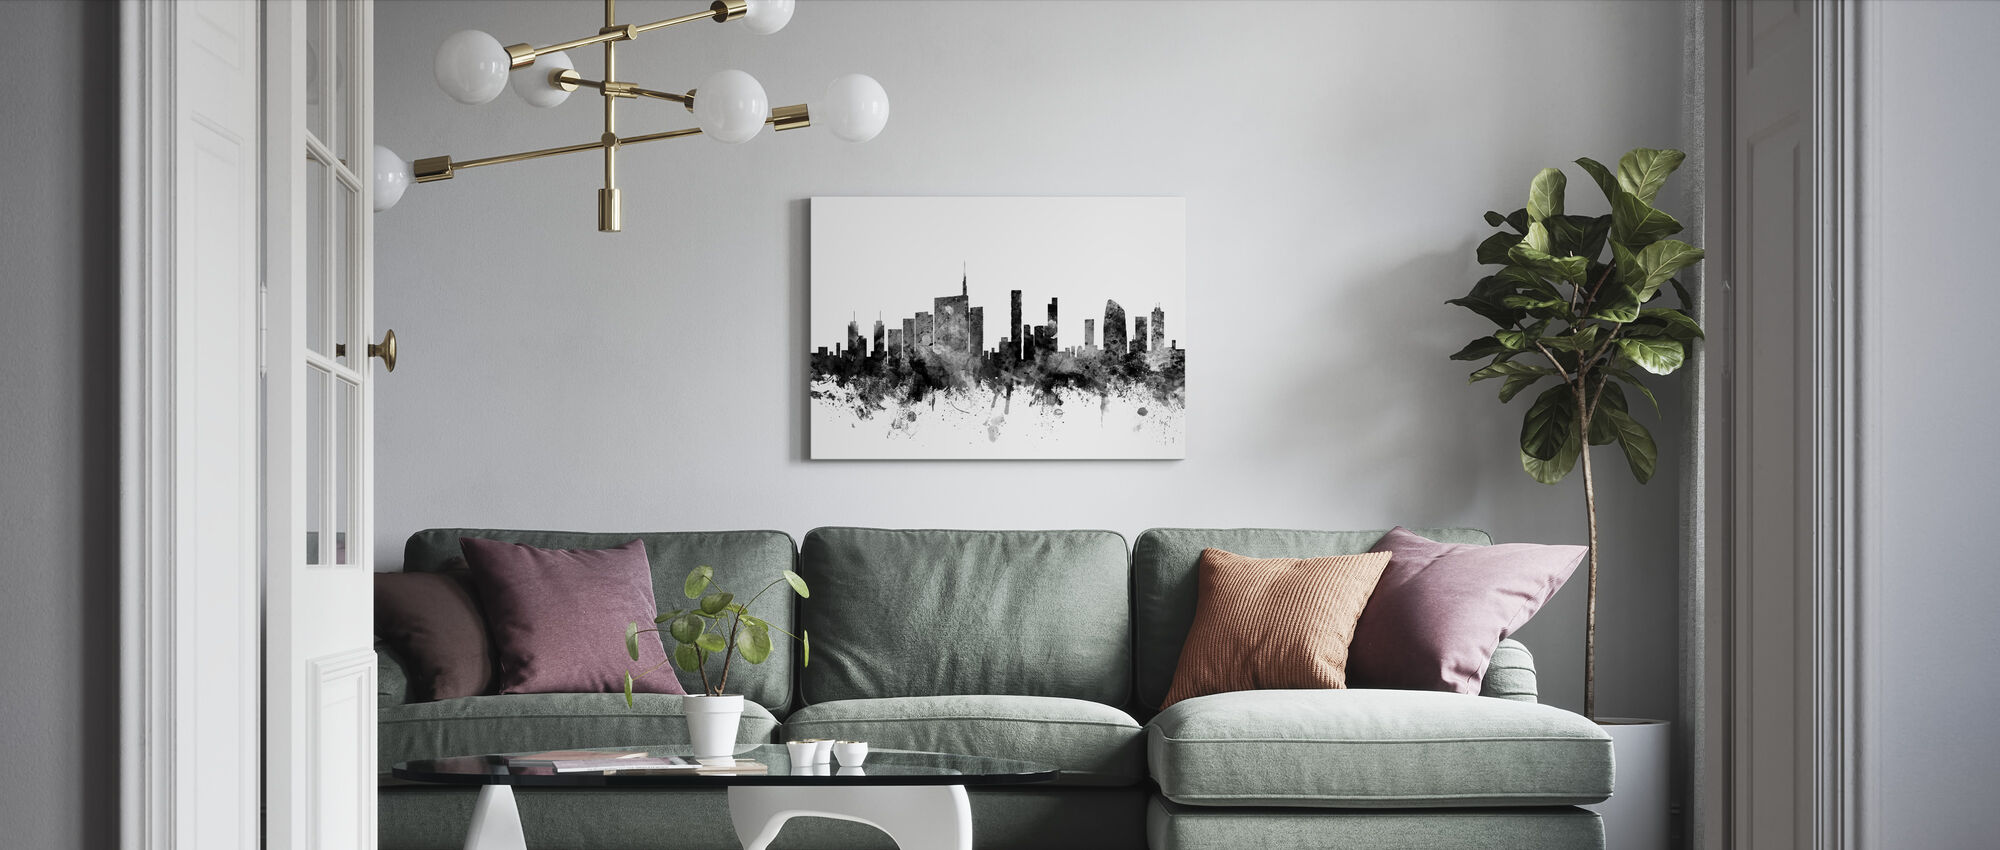 Milan Skyline Svart - Canvastavla - Vardagsrum